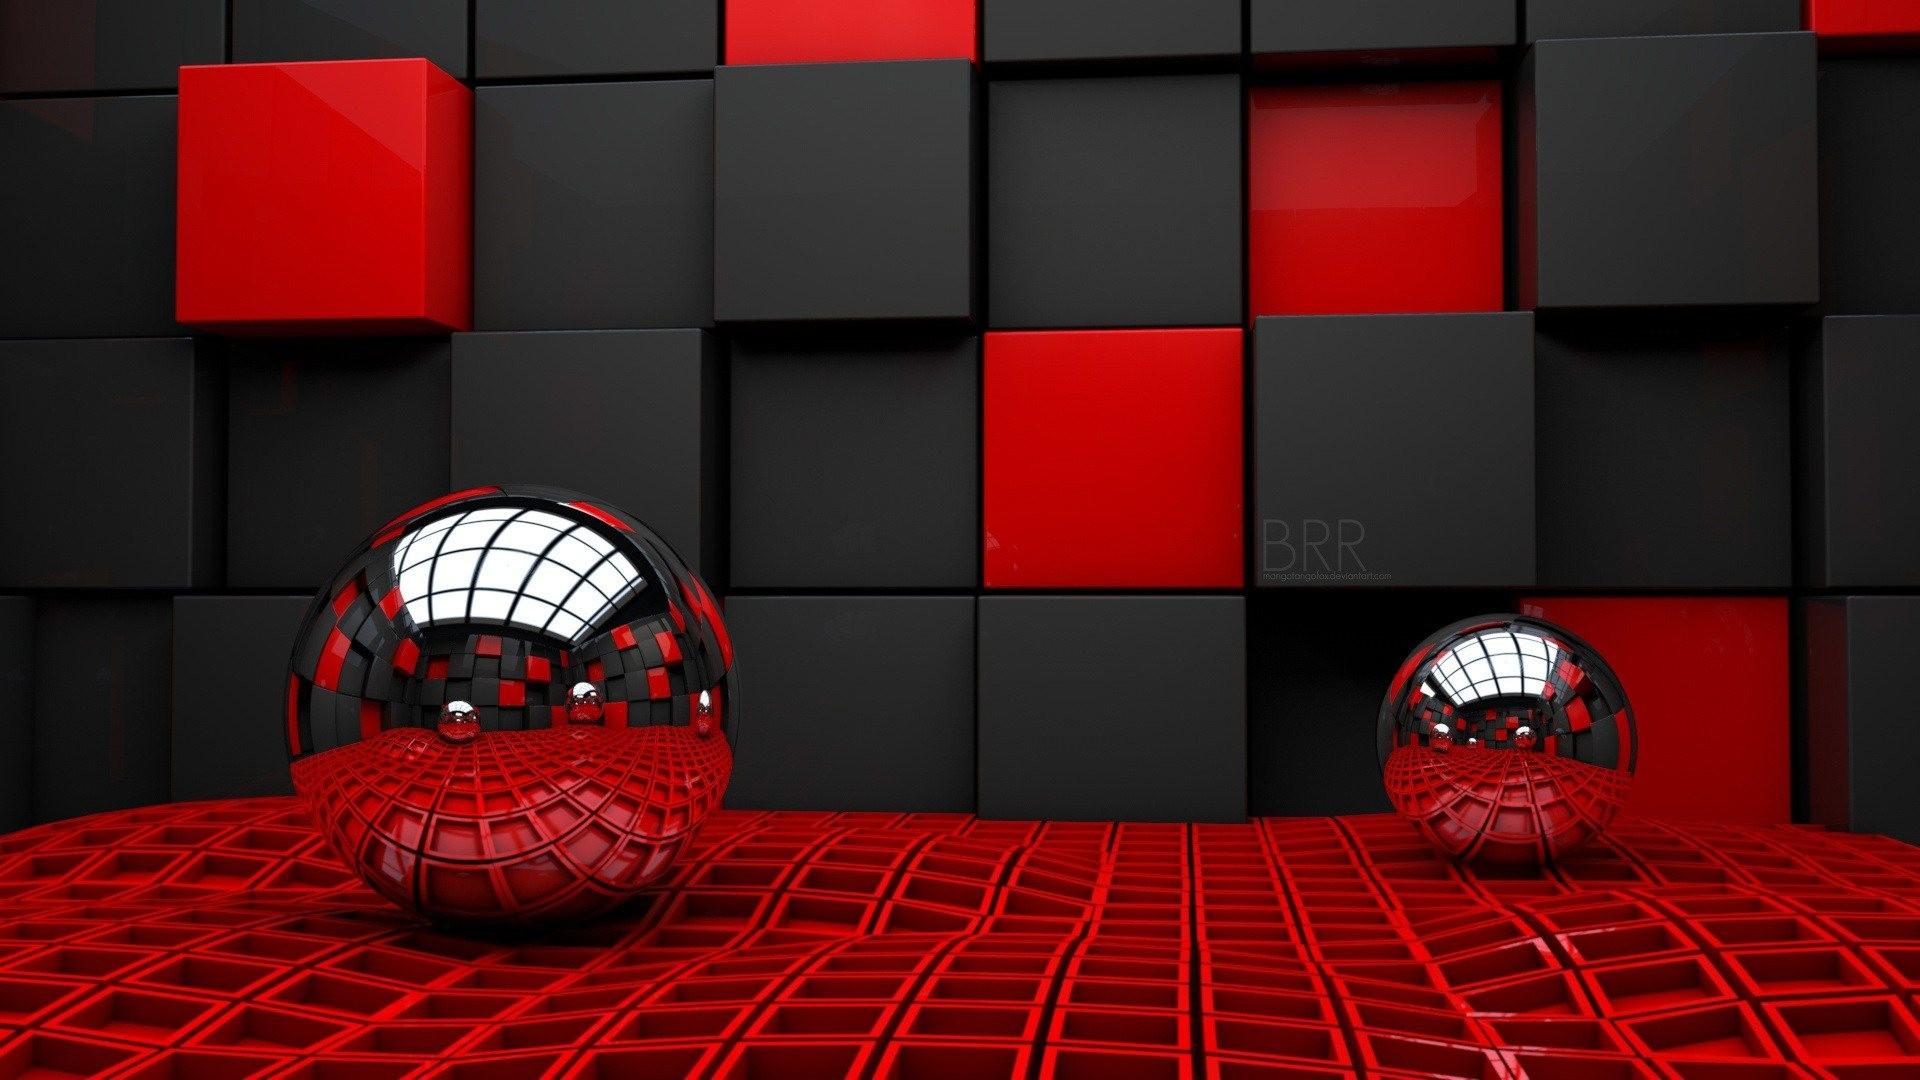 3d red wallpaper widescreen high resolution for desktop background pictures  free download 3d desktop wallpapers